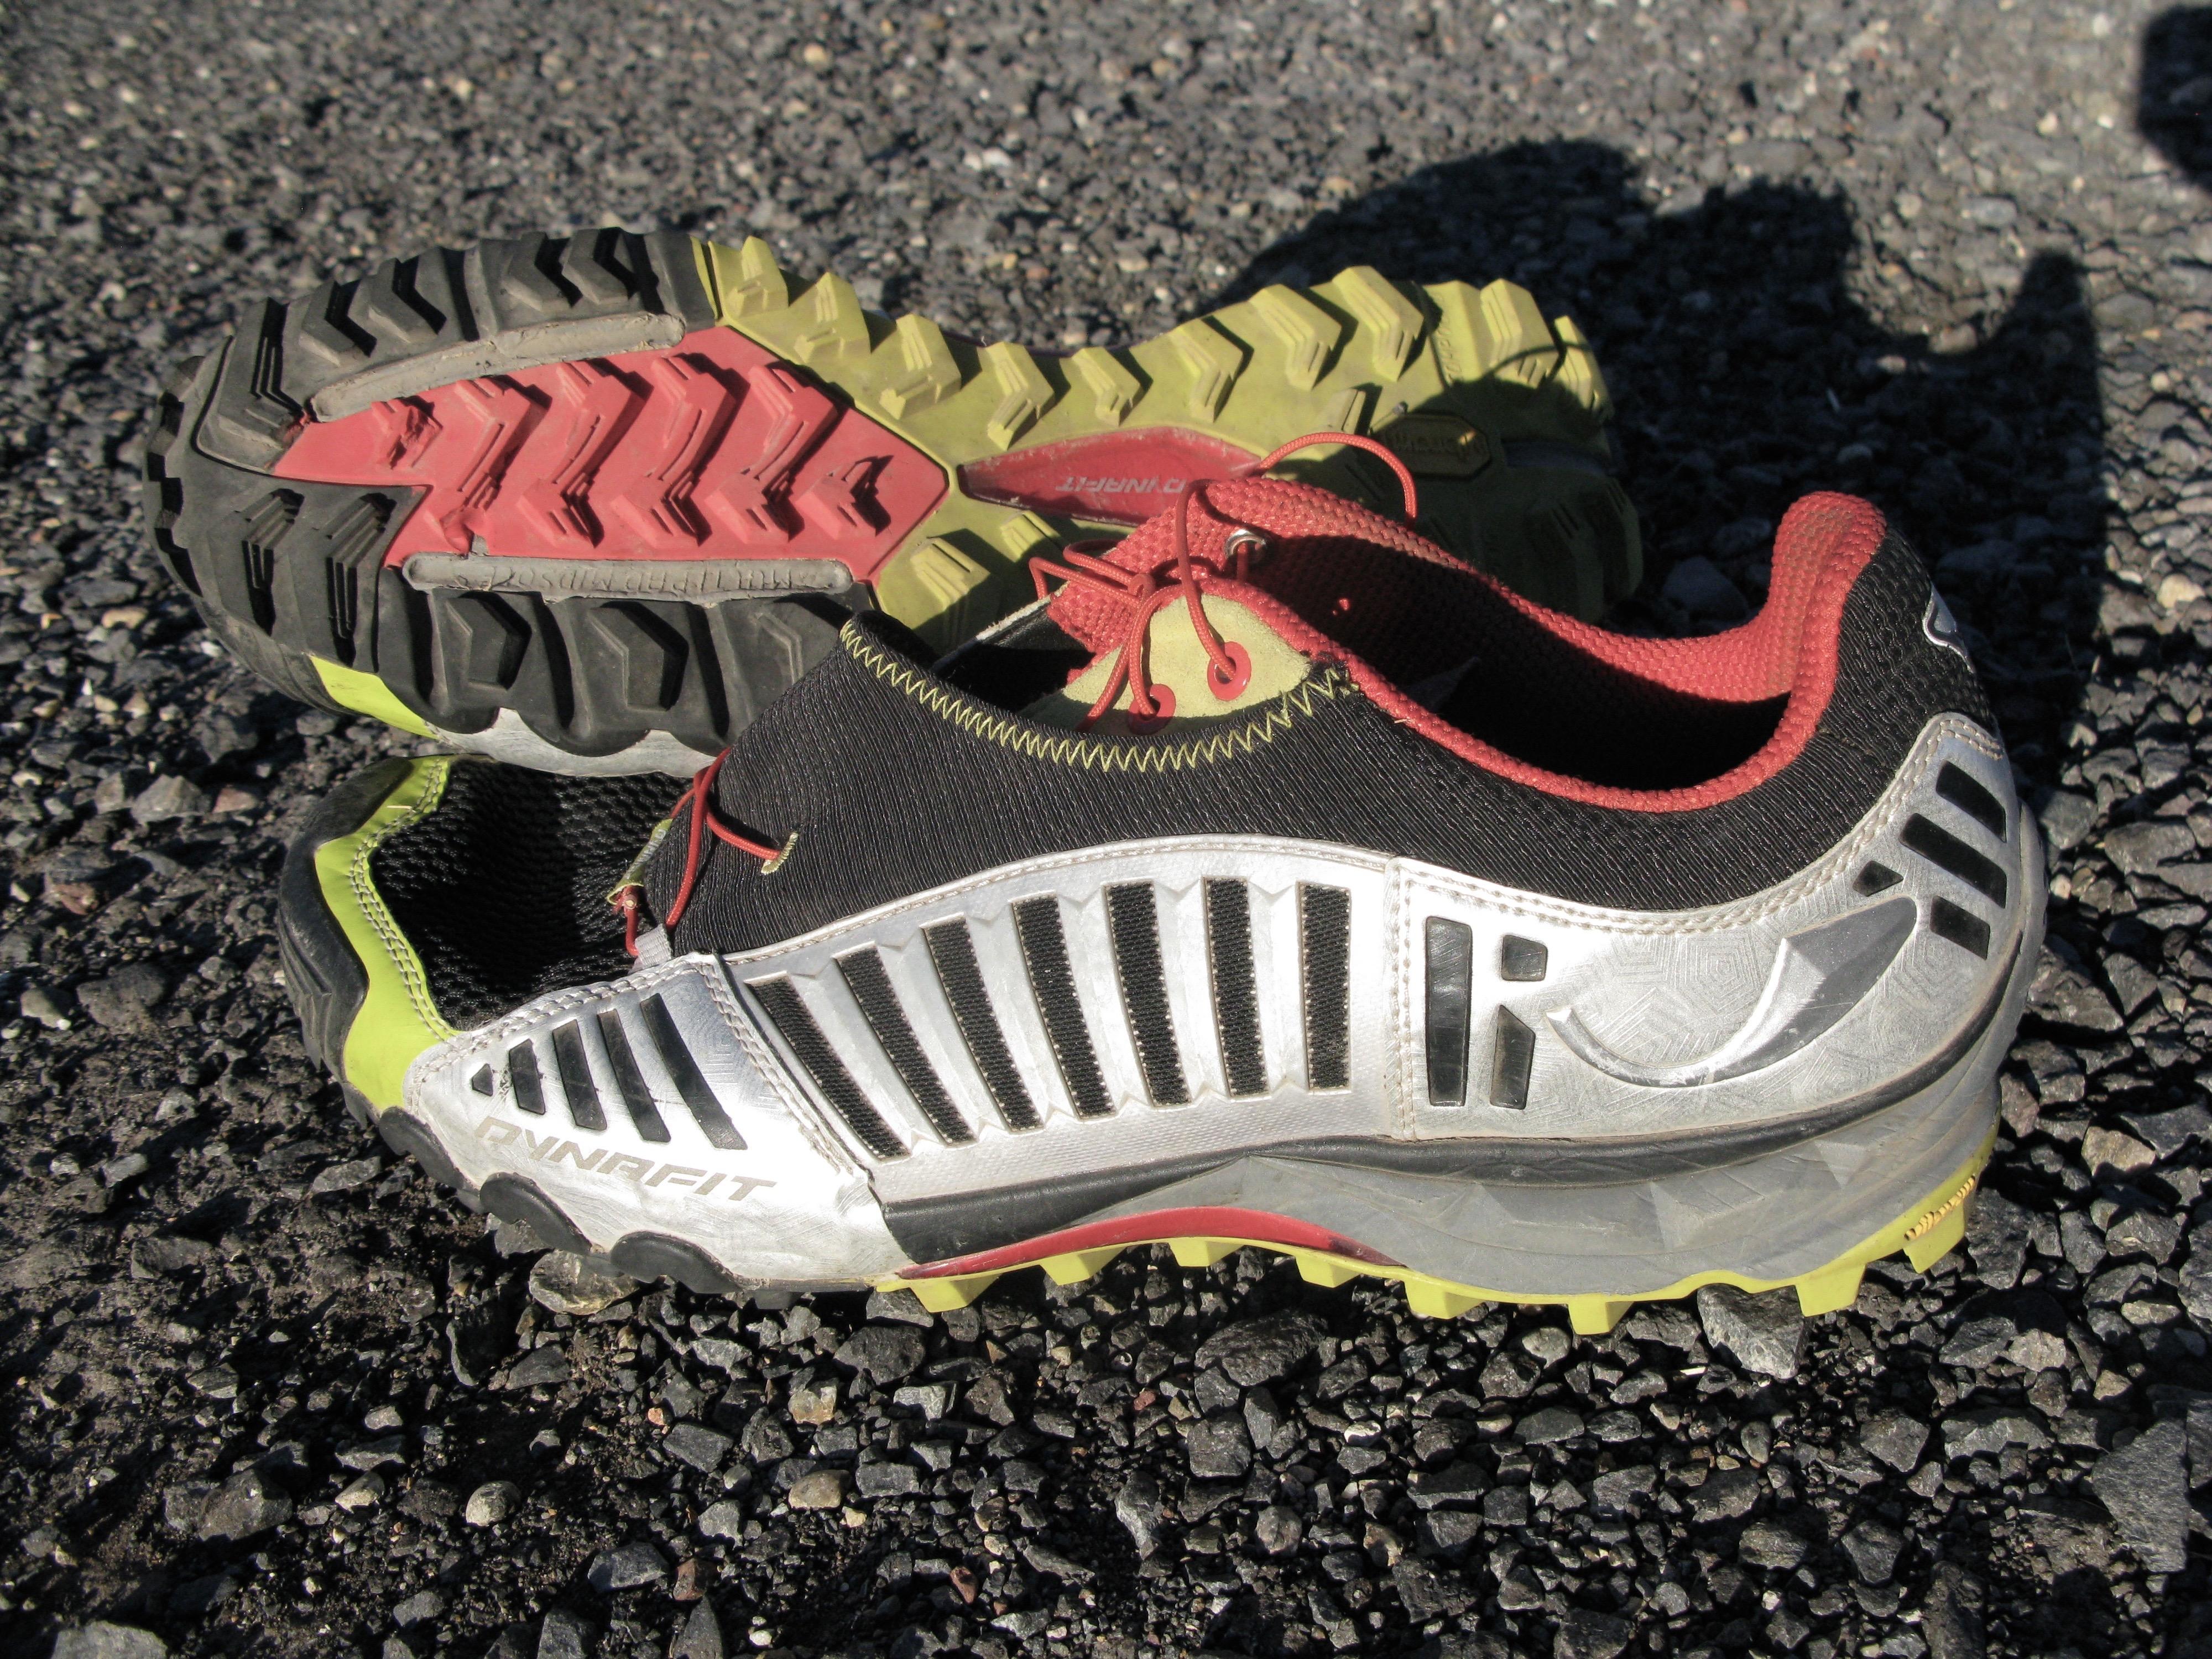 Dynafit Trail Running Shoes